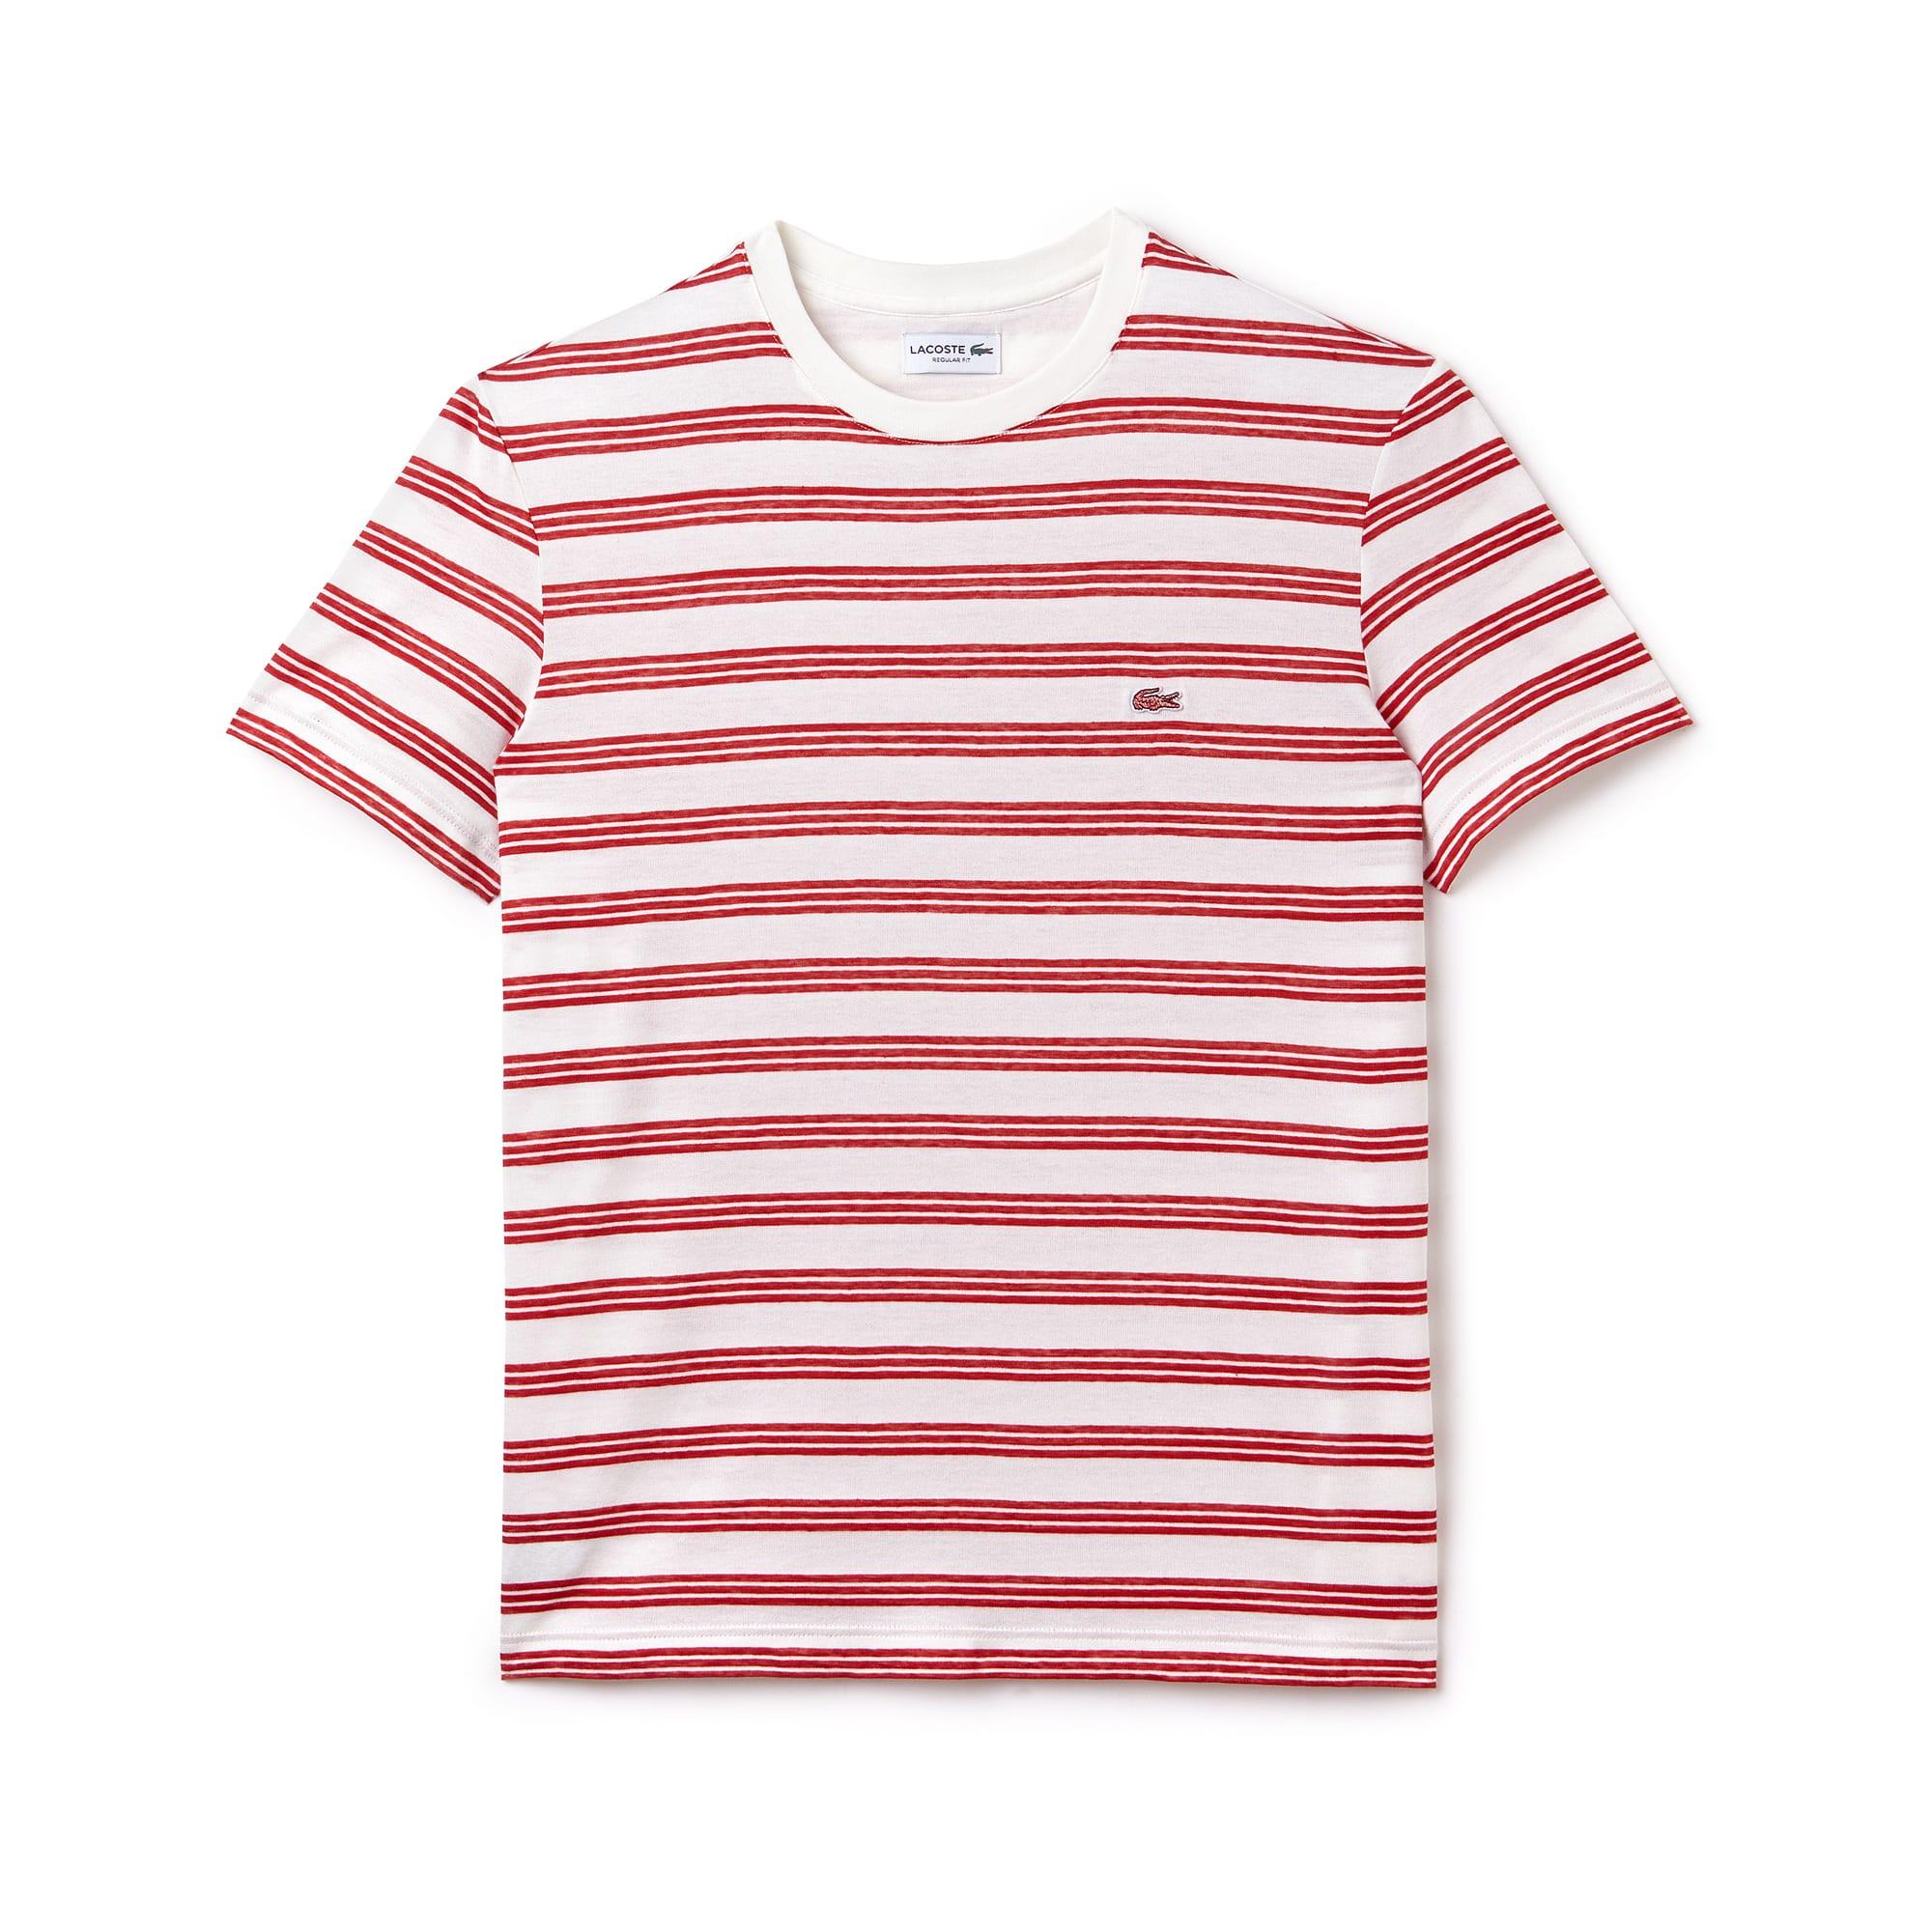 Men's Crew Neck Linen Jersey Striped Cotton T-Shirt